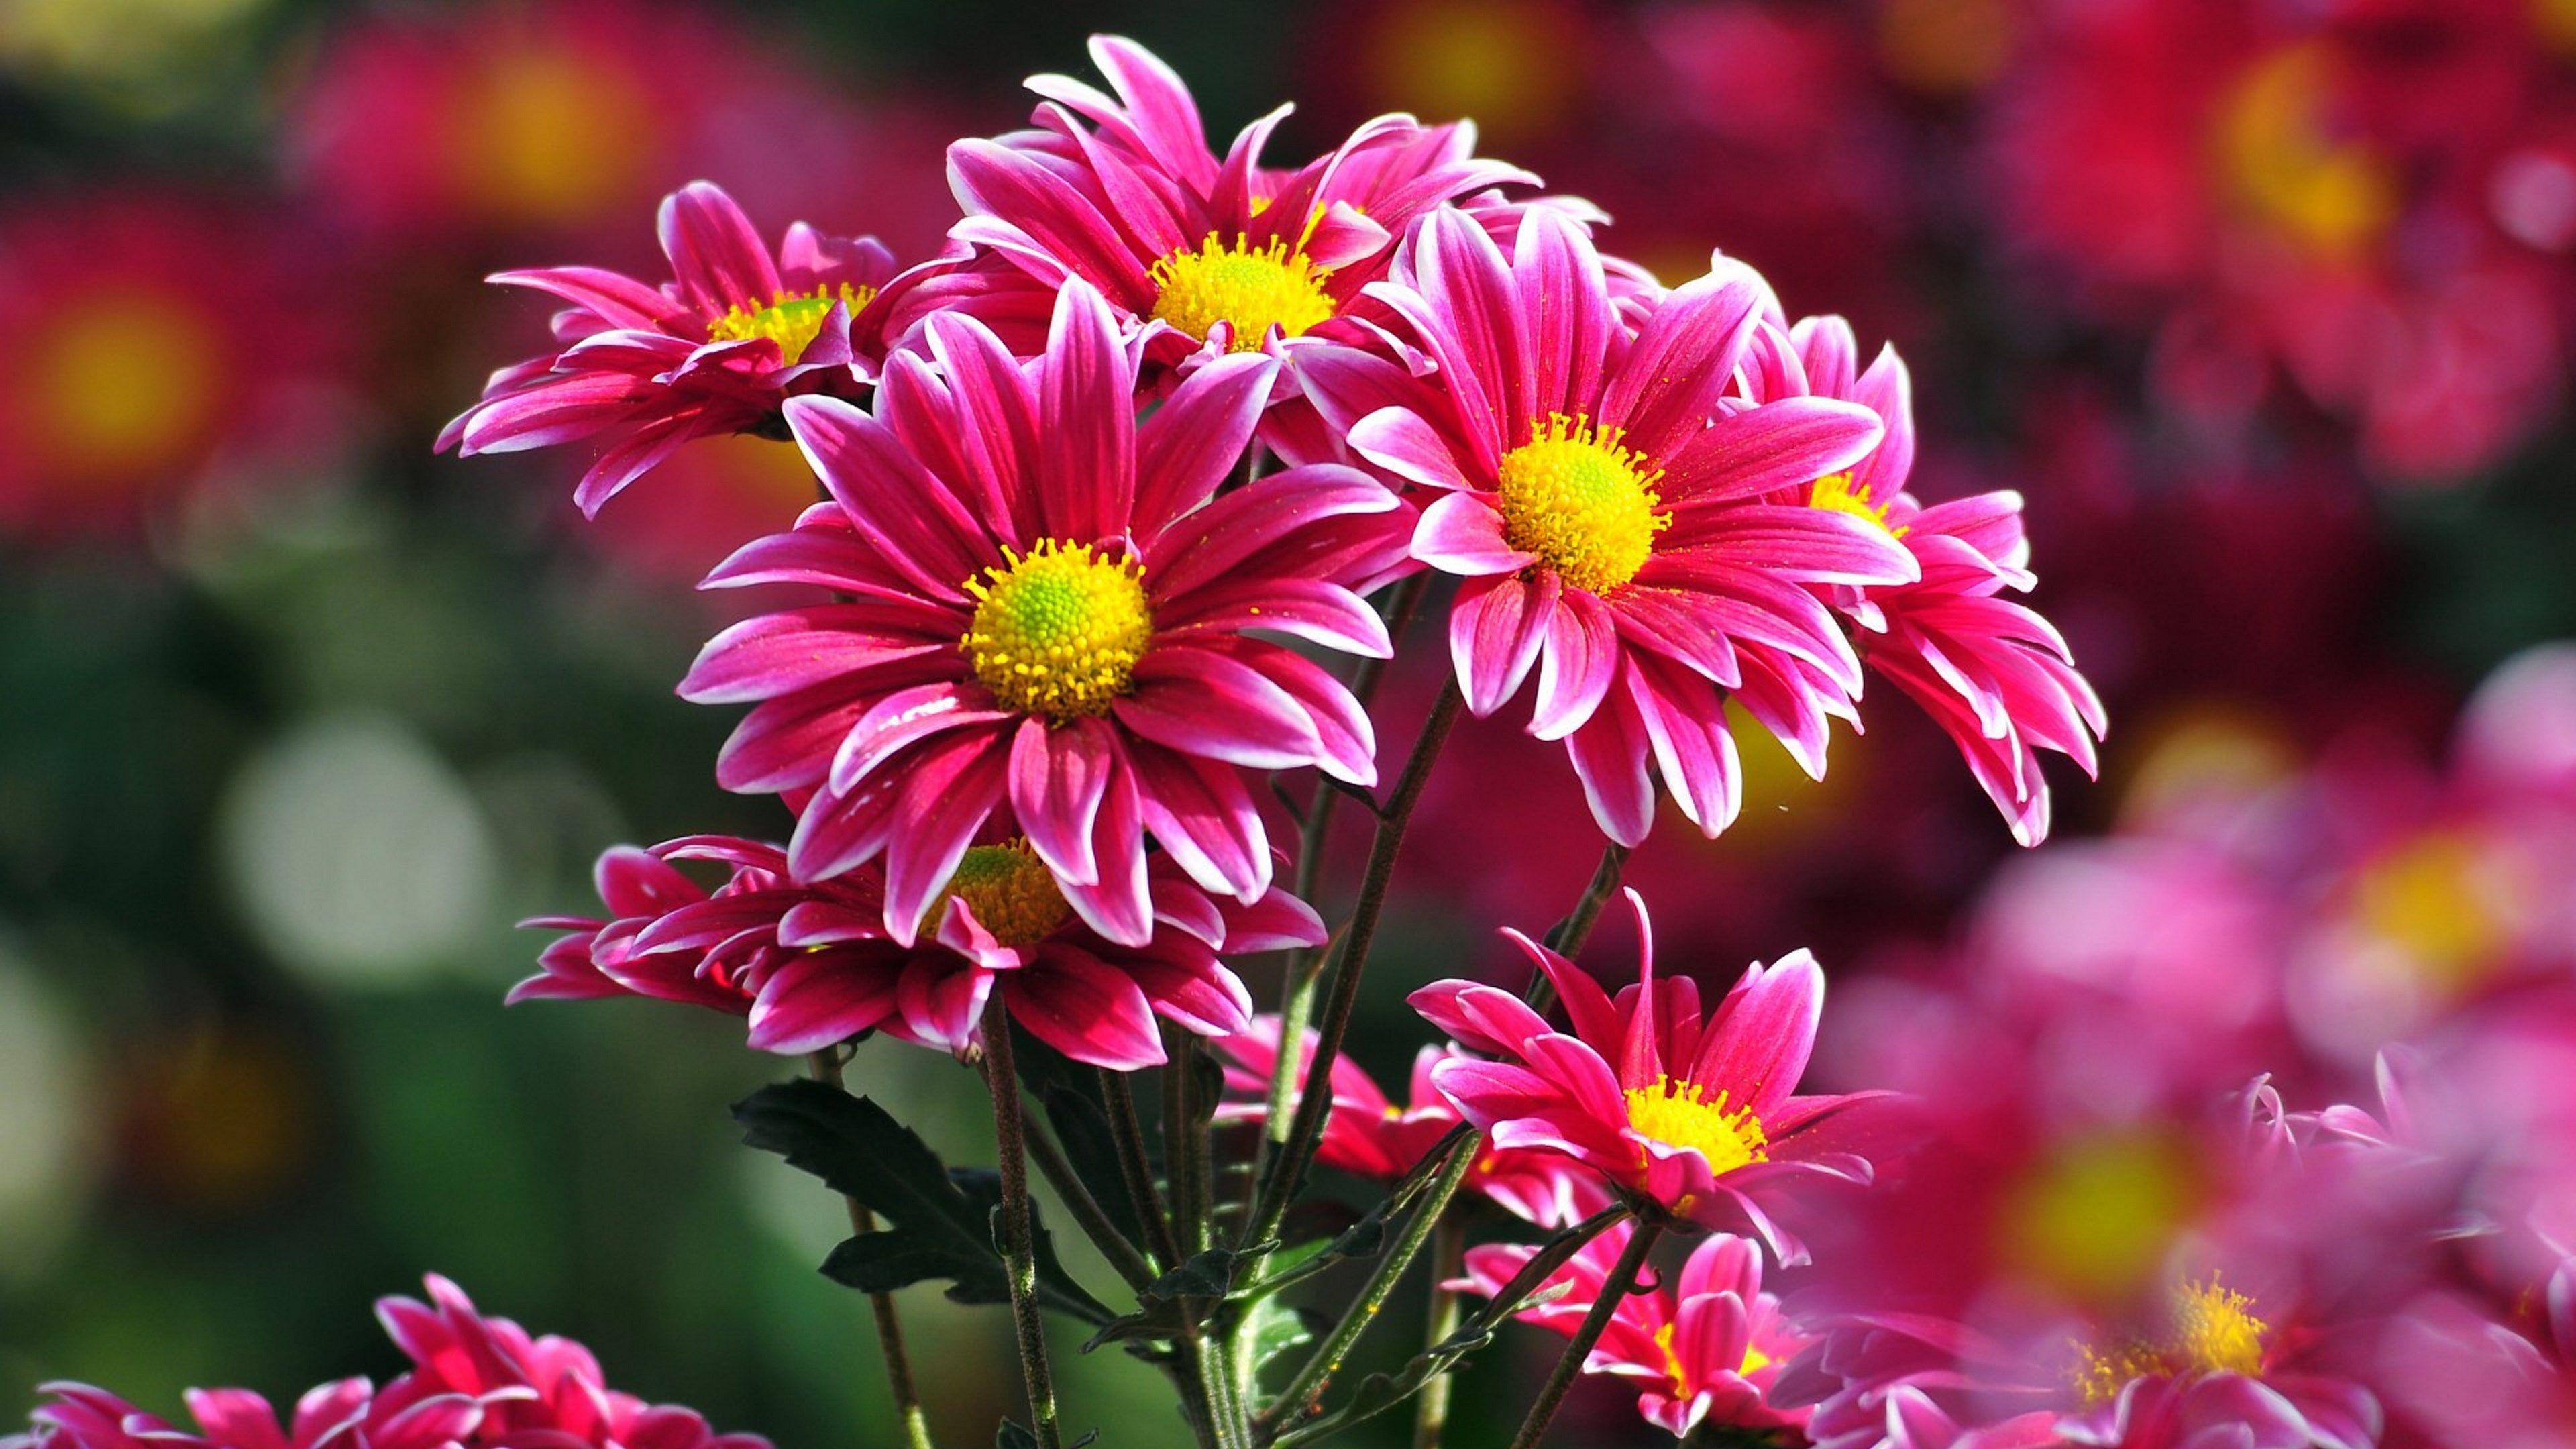 4k pc wallpaper download (3840x2160) Beautiful flowers